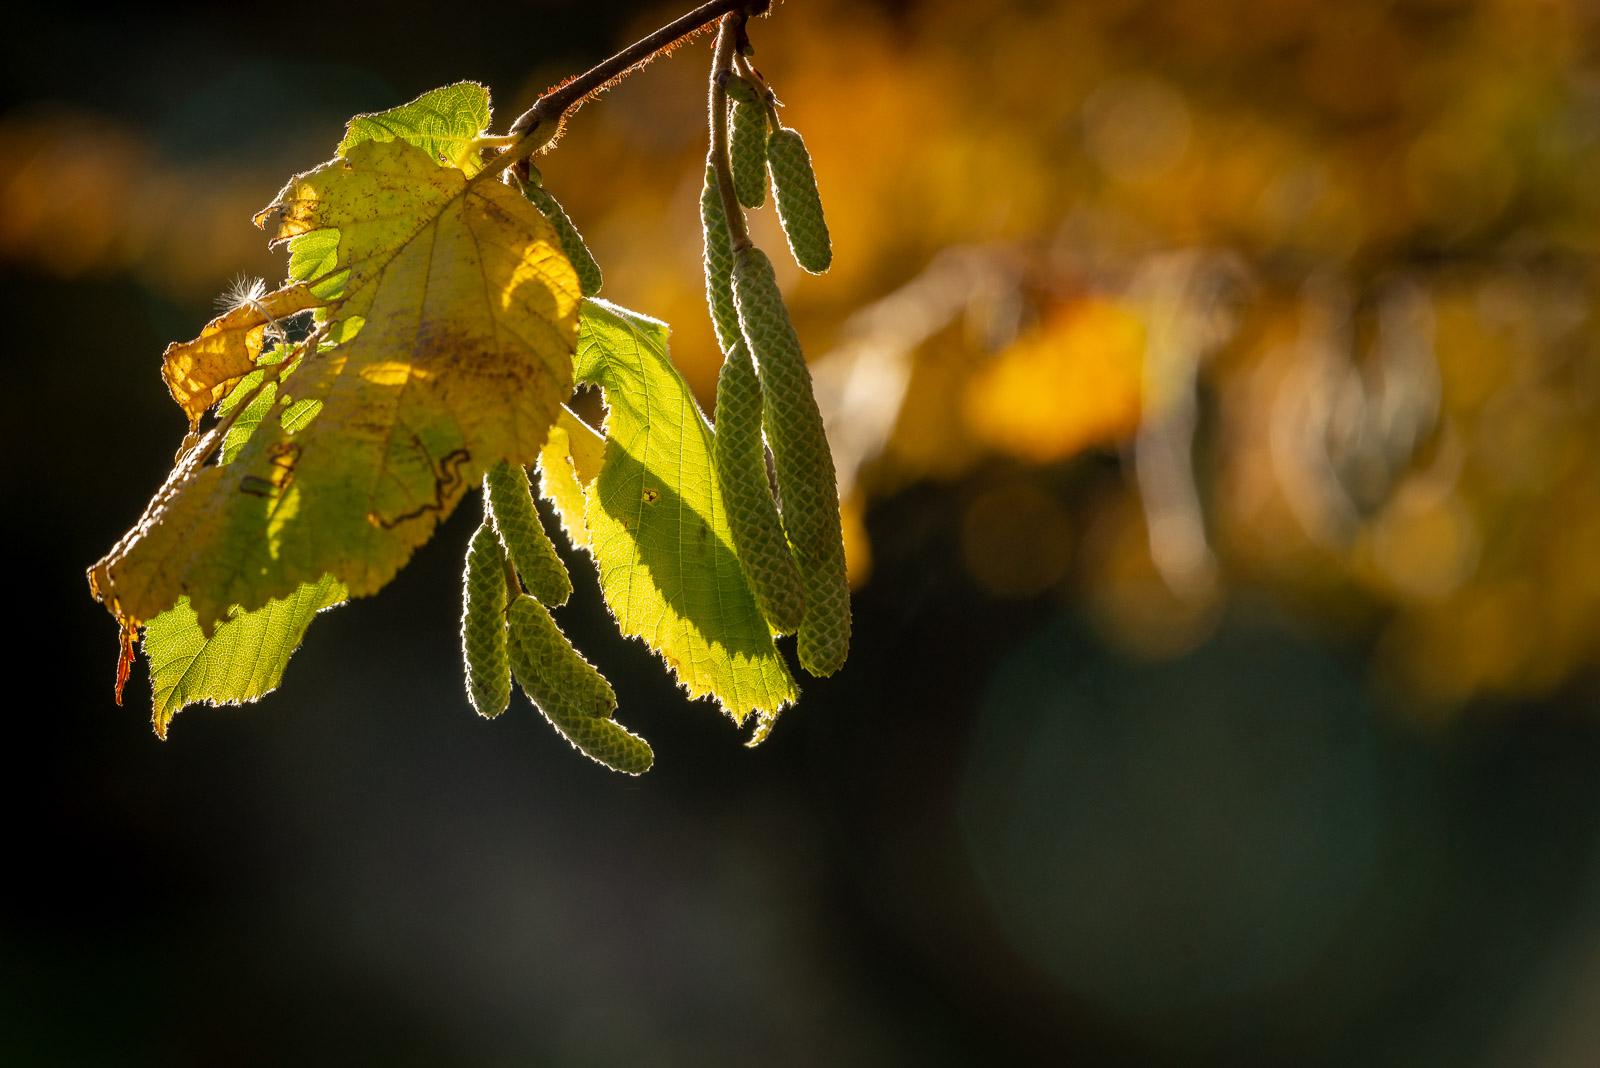 Autumn Leaves - Lynchcombe, Somerset, UK. ID 826_2891